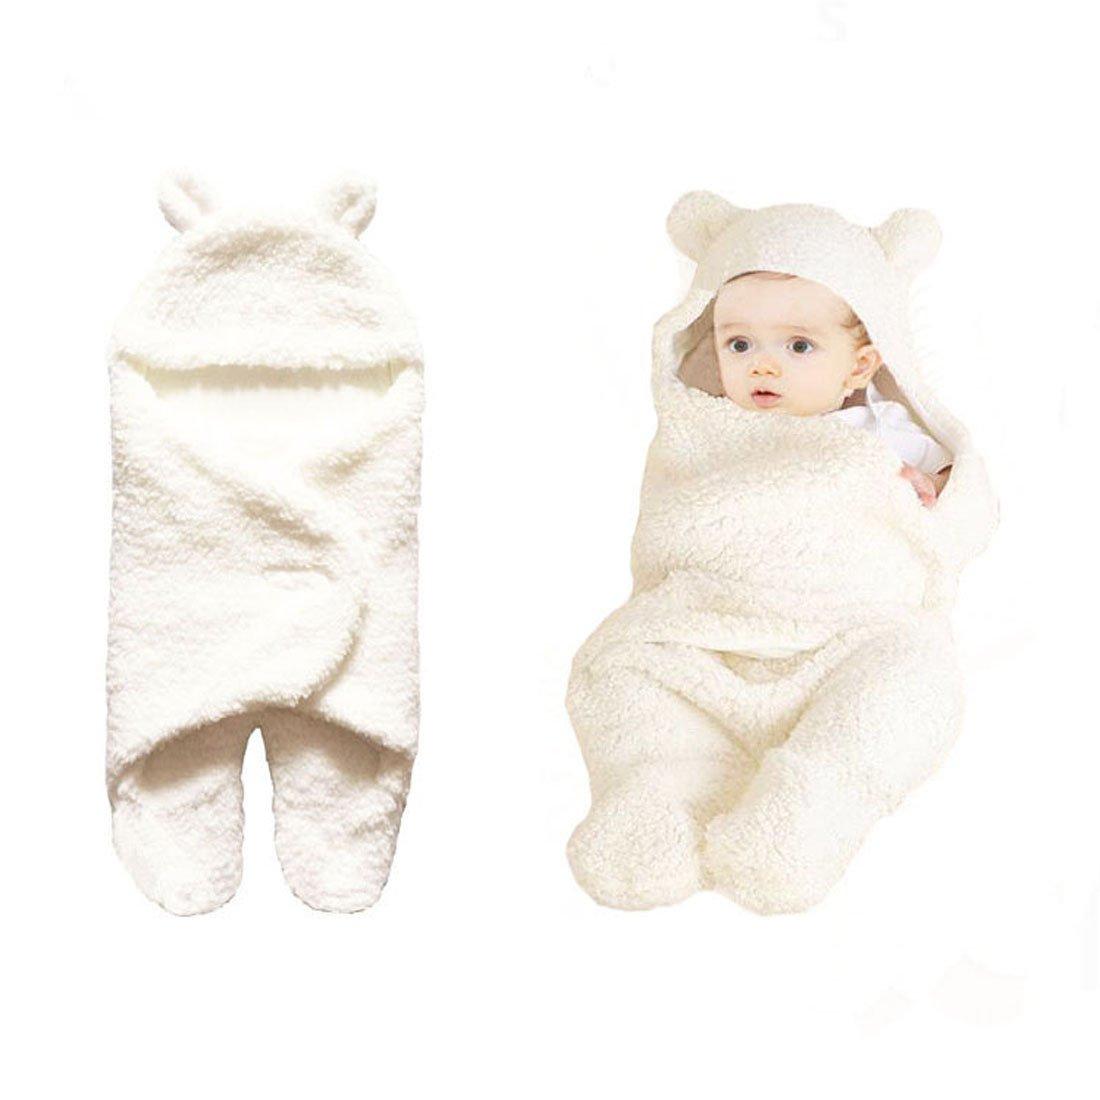 Wolmund Newborn Baby Boys Girls 0-12 Months Cute Cotton Receiving Sleeping Blanket Gift Soft Plush Wrap Swaddle White